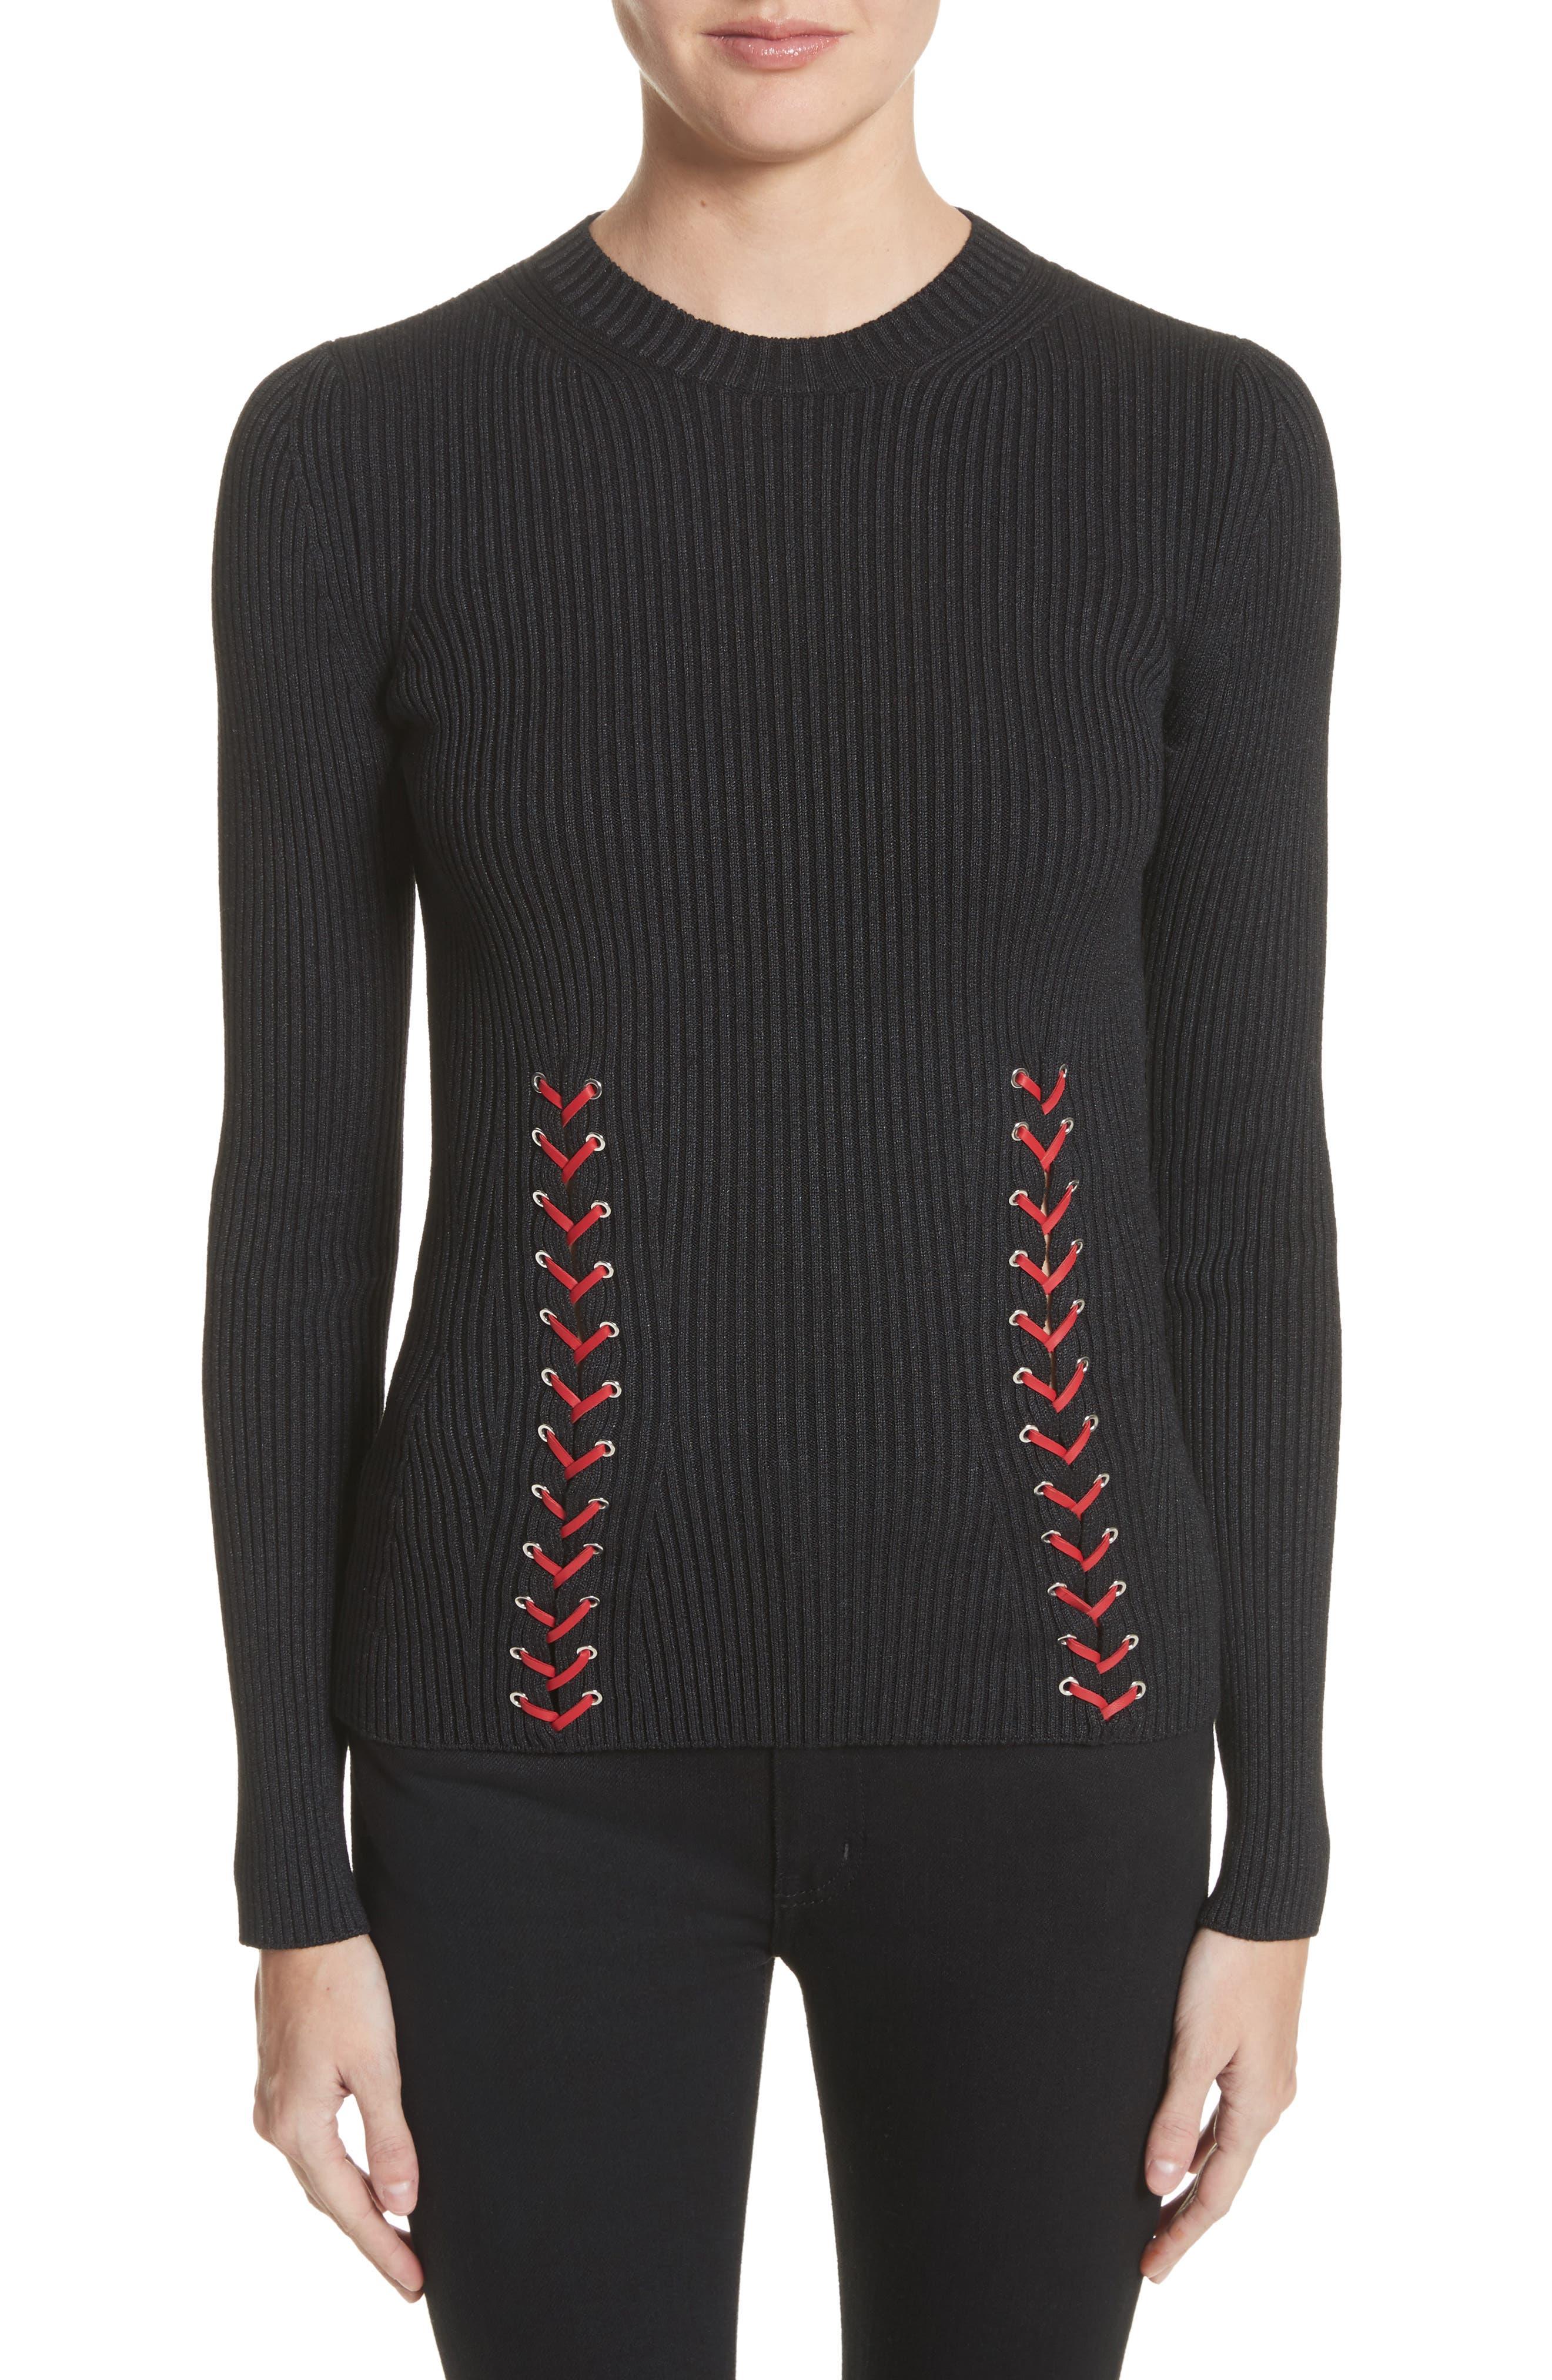 Alternate Image 1 Selected - Alexander McQueen Leather Braid Silk Blend Sweater